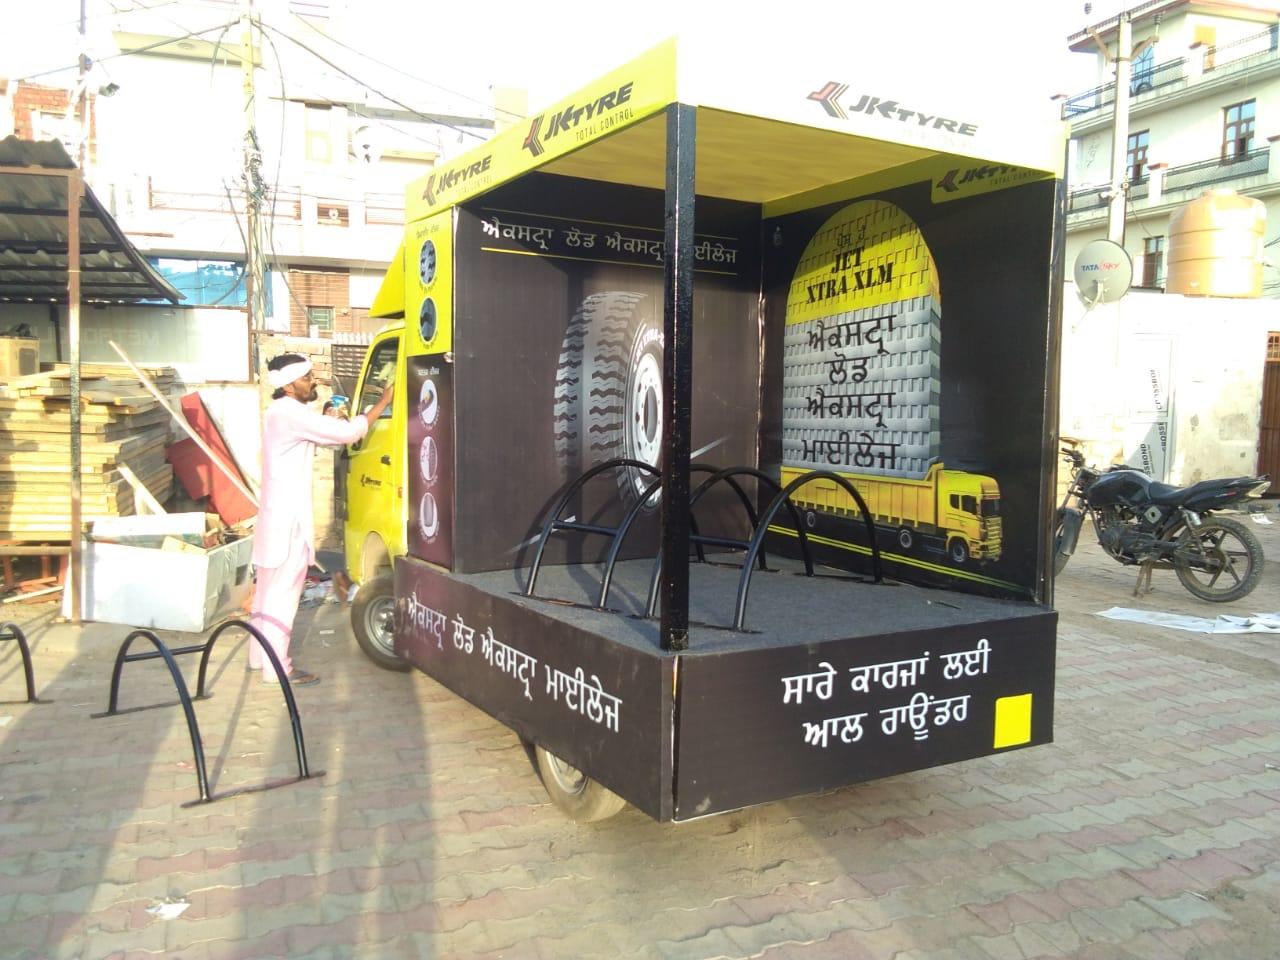 Video Van Campaign